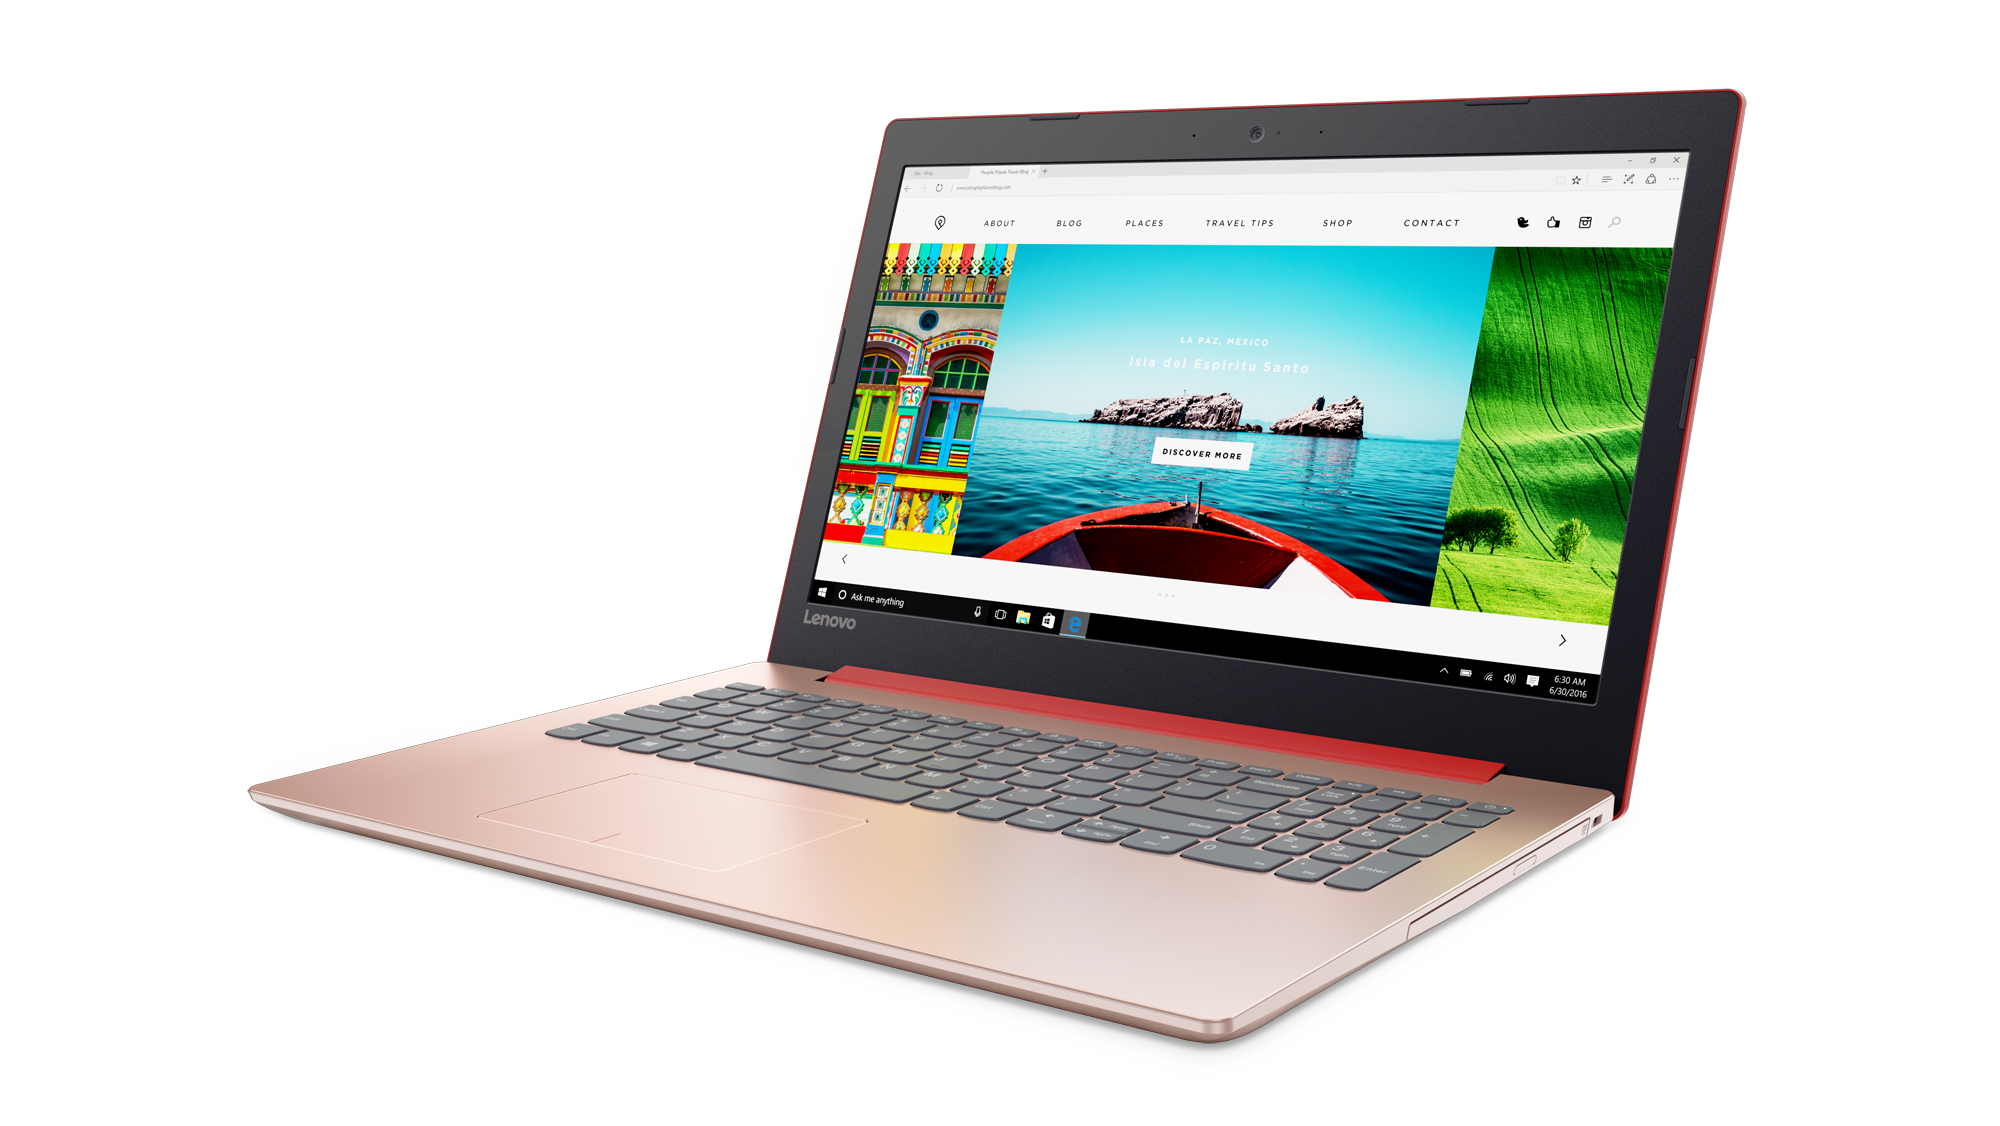 "Lenovo IdeaPad 320-15ISK i3-6006U 3,10GHz/8GB/SSD 256GB/15,6"" FHD/AG/GeForce 2GB/WIN10 červená 80XH003MCK"